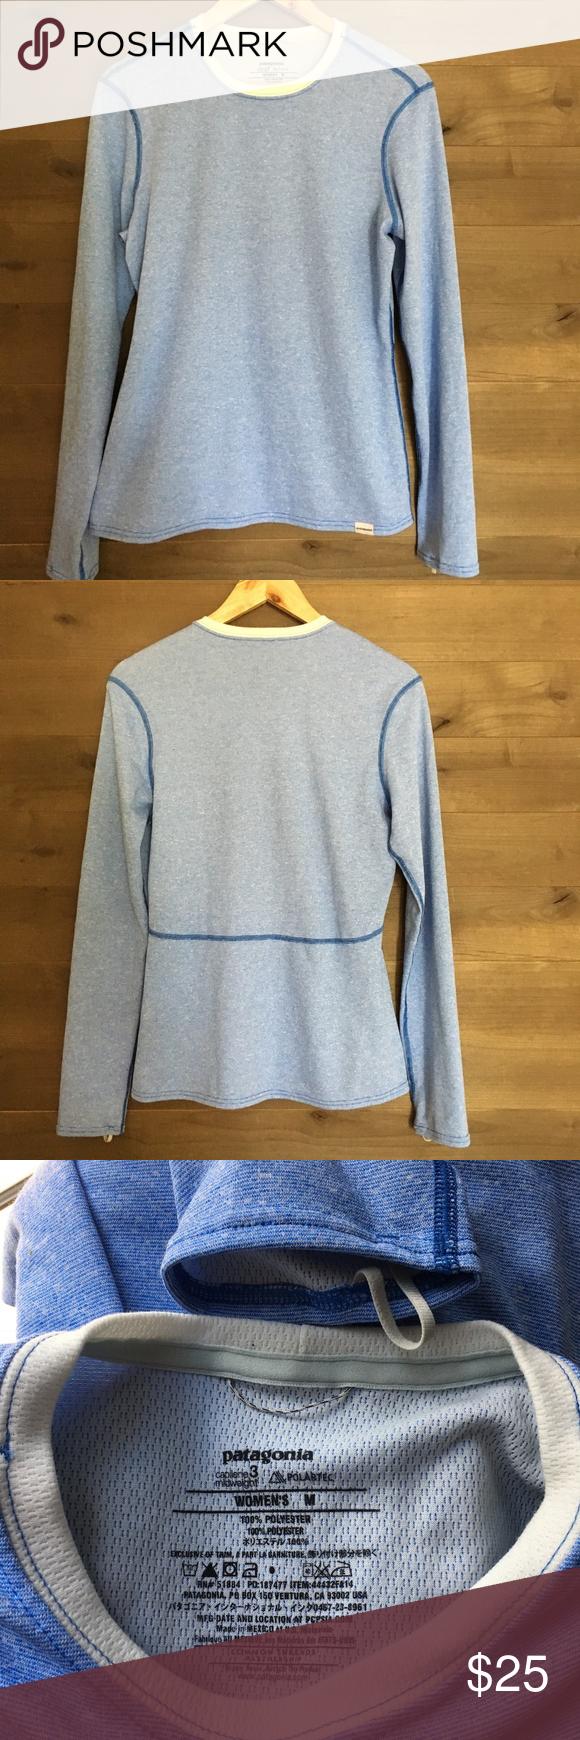 Patagonia Capilene 3 Midweight Crew Top Tee Shirt Tee Shirts Clothes Design Long Sleeve Tees [ 1740 x 580 Pixel ]